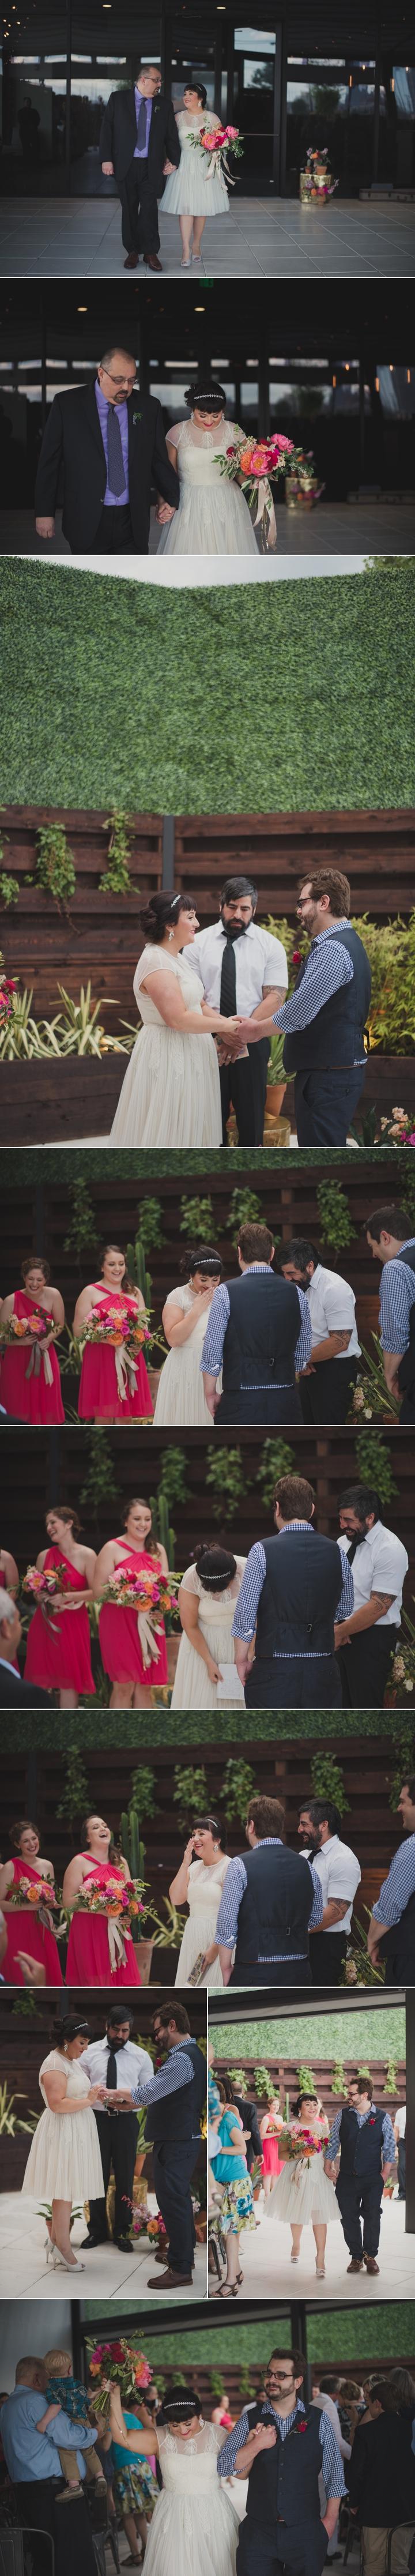 dallas-wedding-photographer-hw 44.jpg